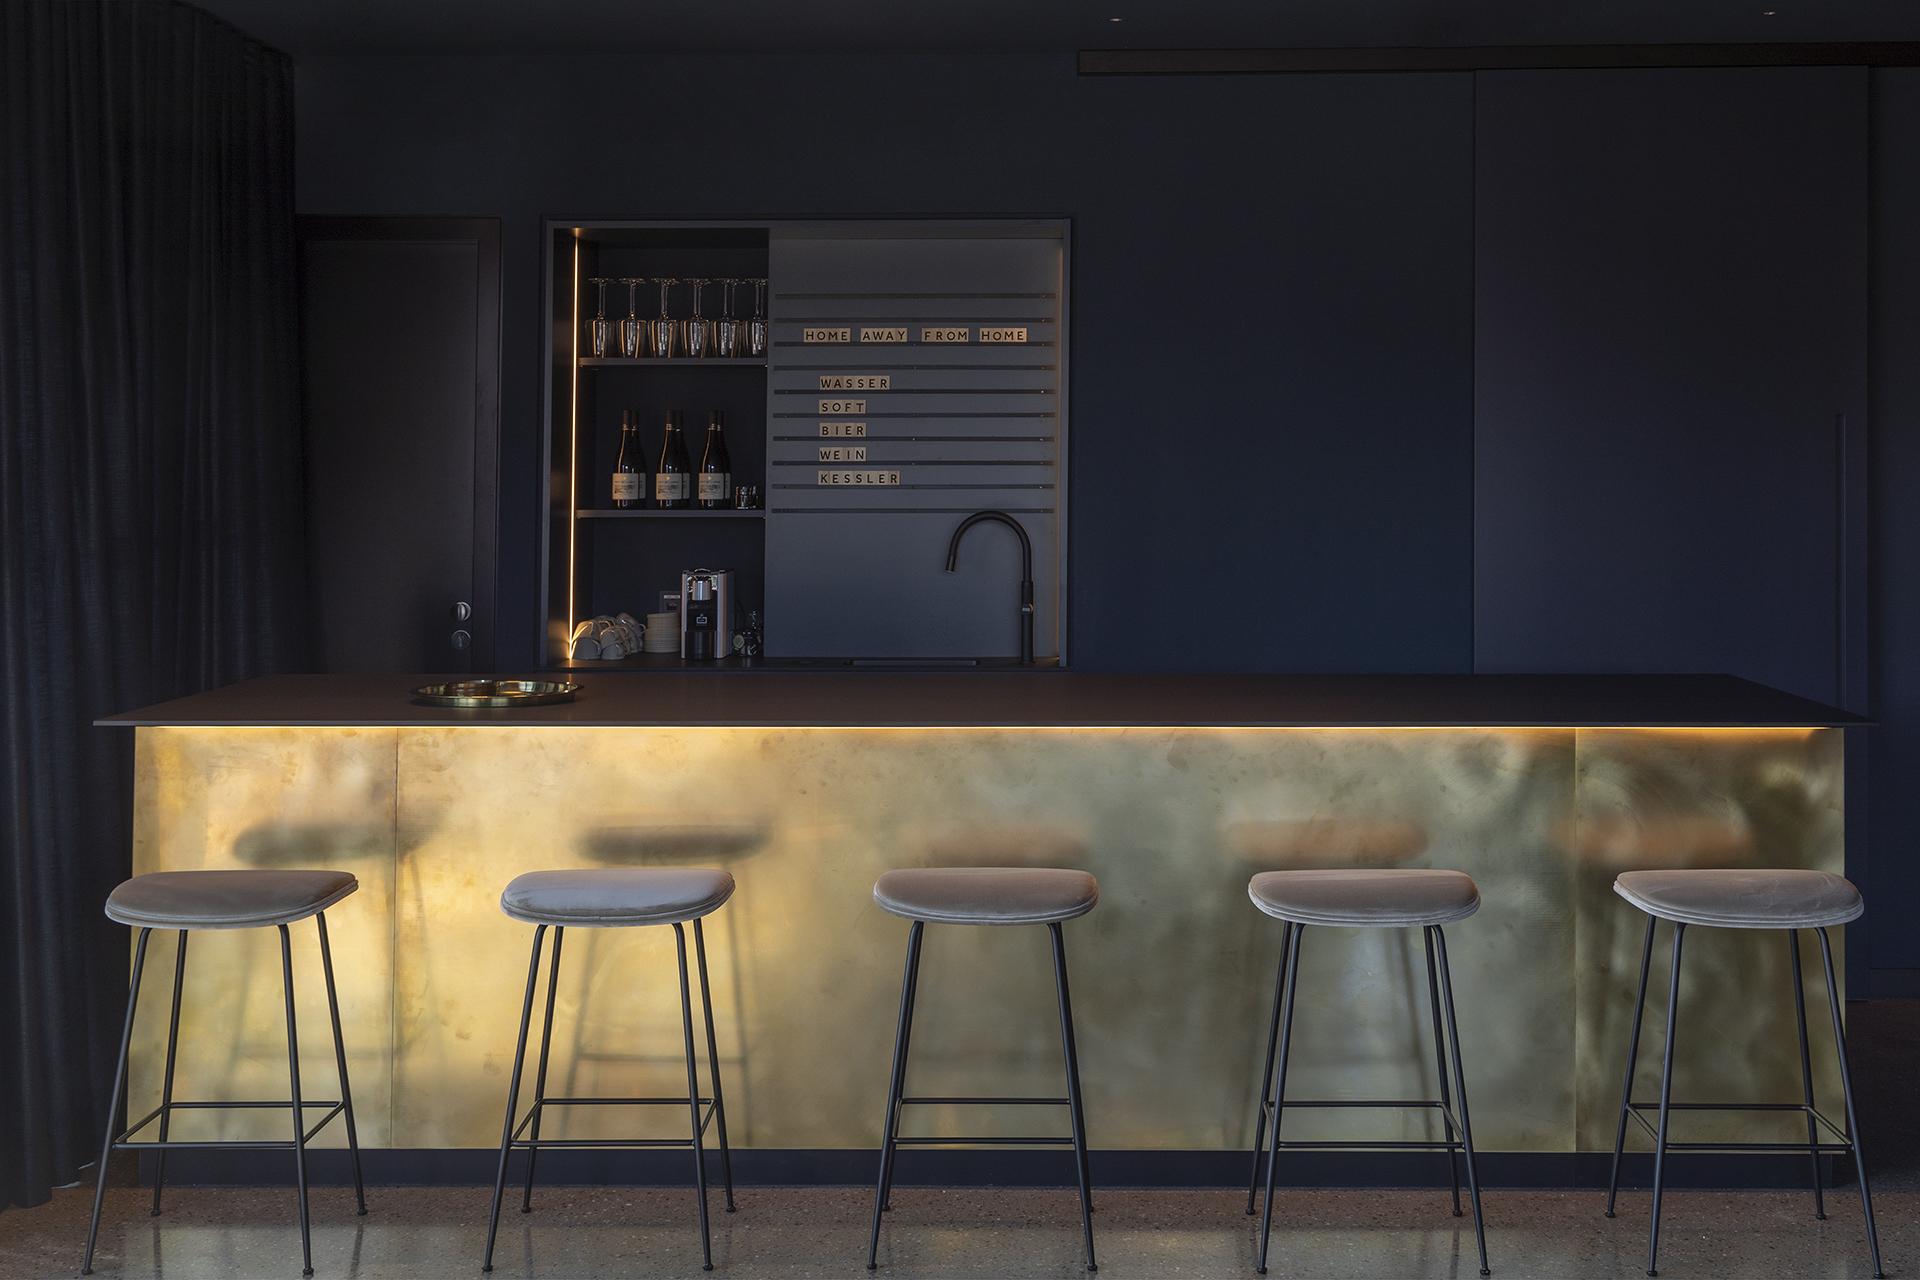 emilu hotel   stuttgart germany   design blocher partners